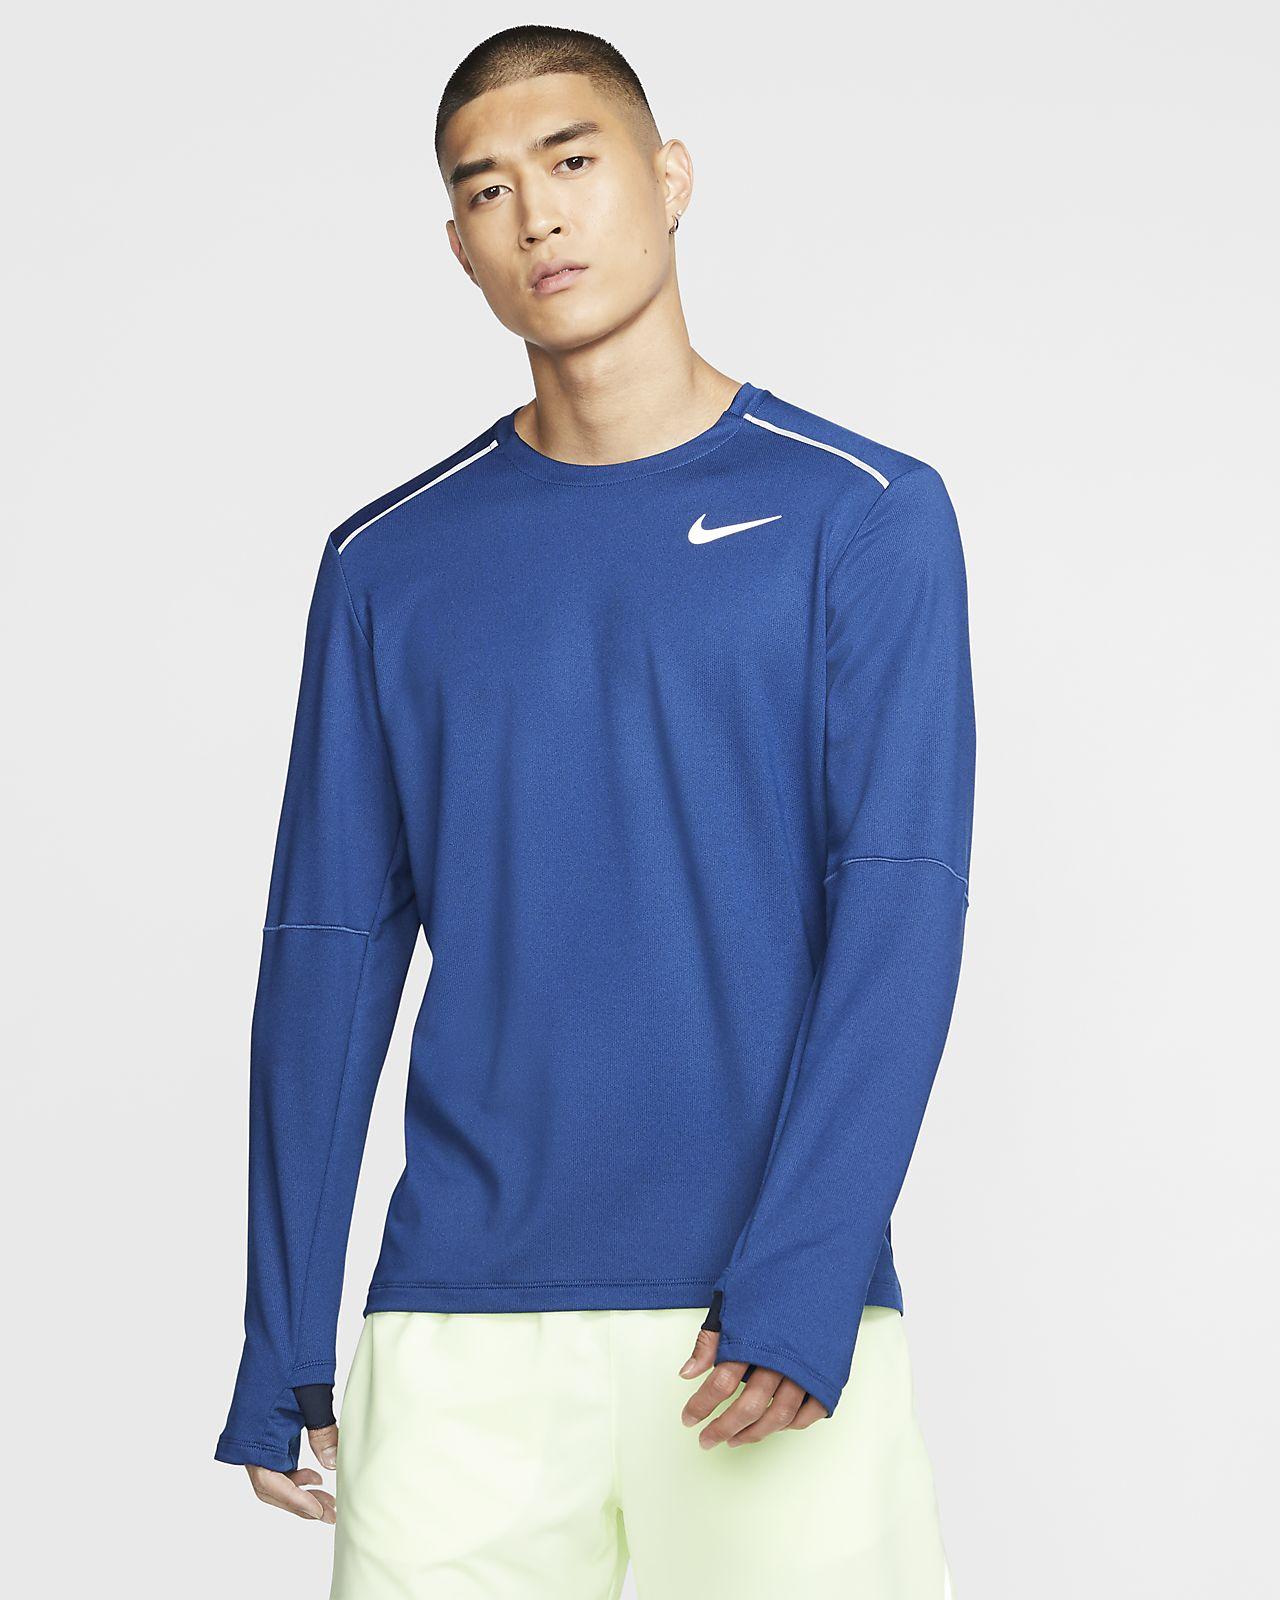 Męska bluza do biegania Nike 3.0